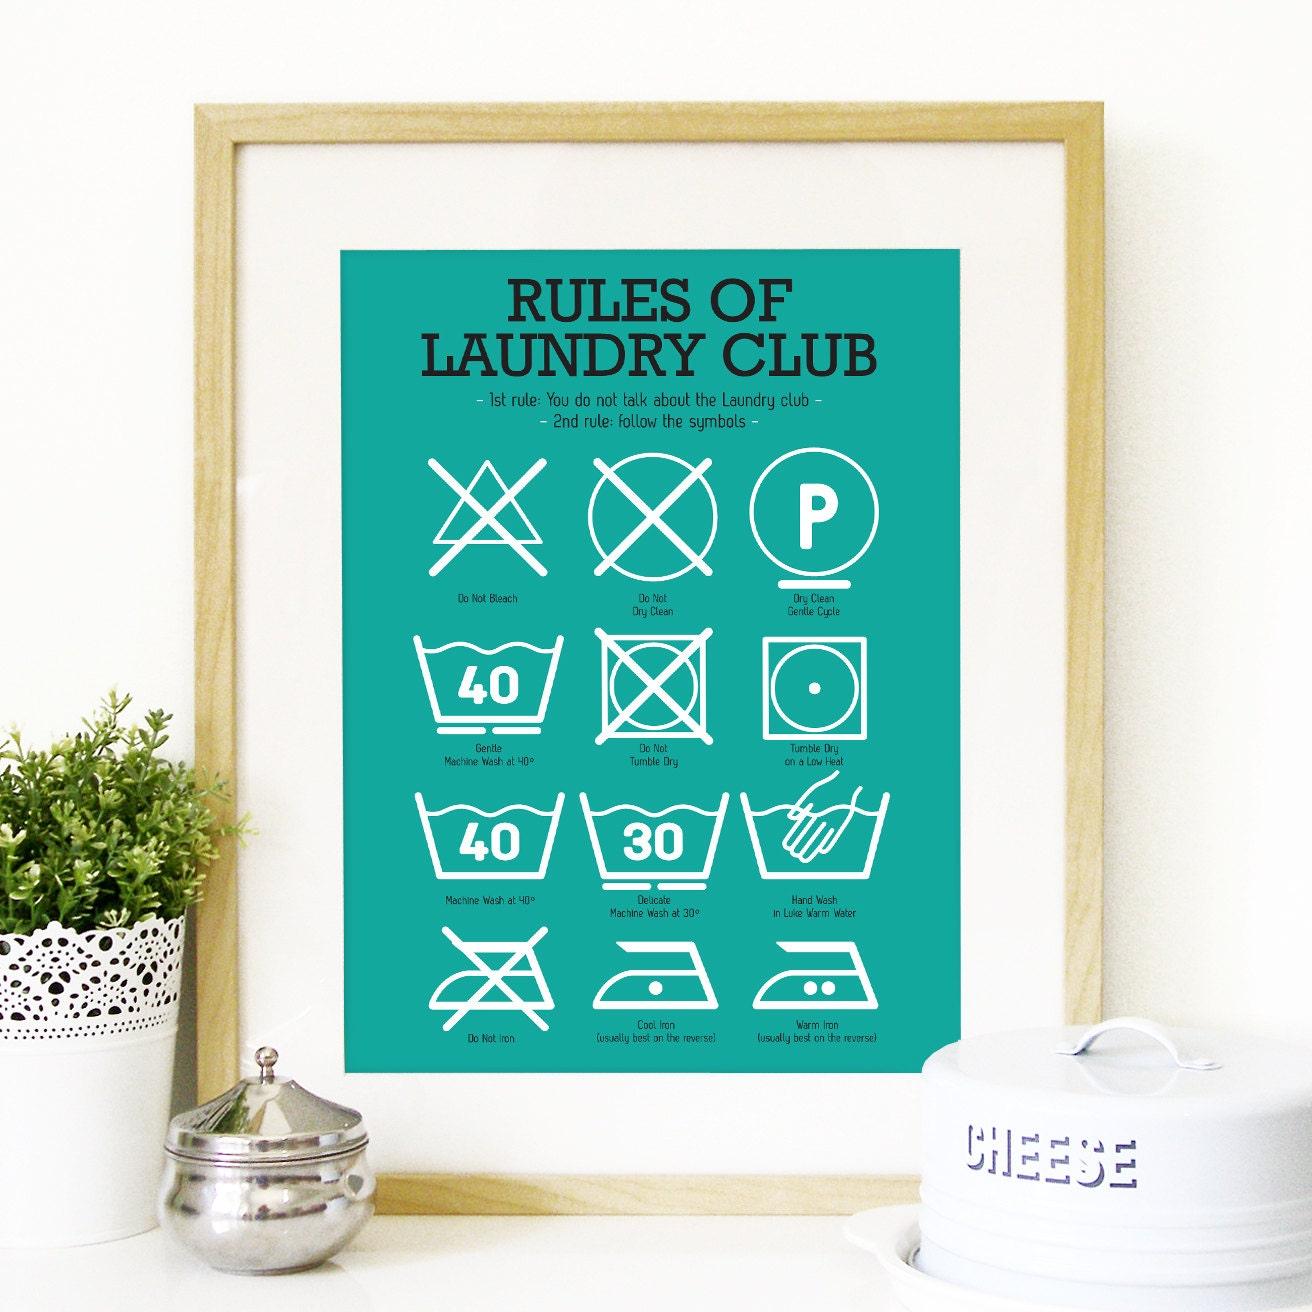 Kitchen Laundry Club Poster Art With Laundry Symbols Explained